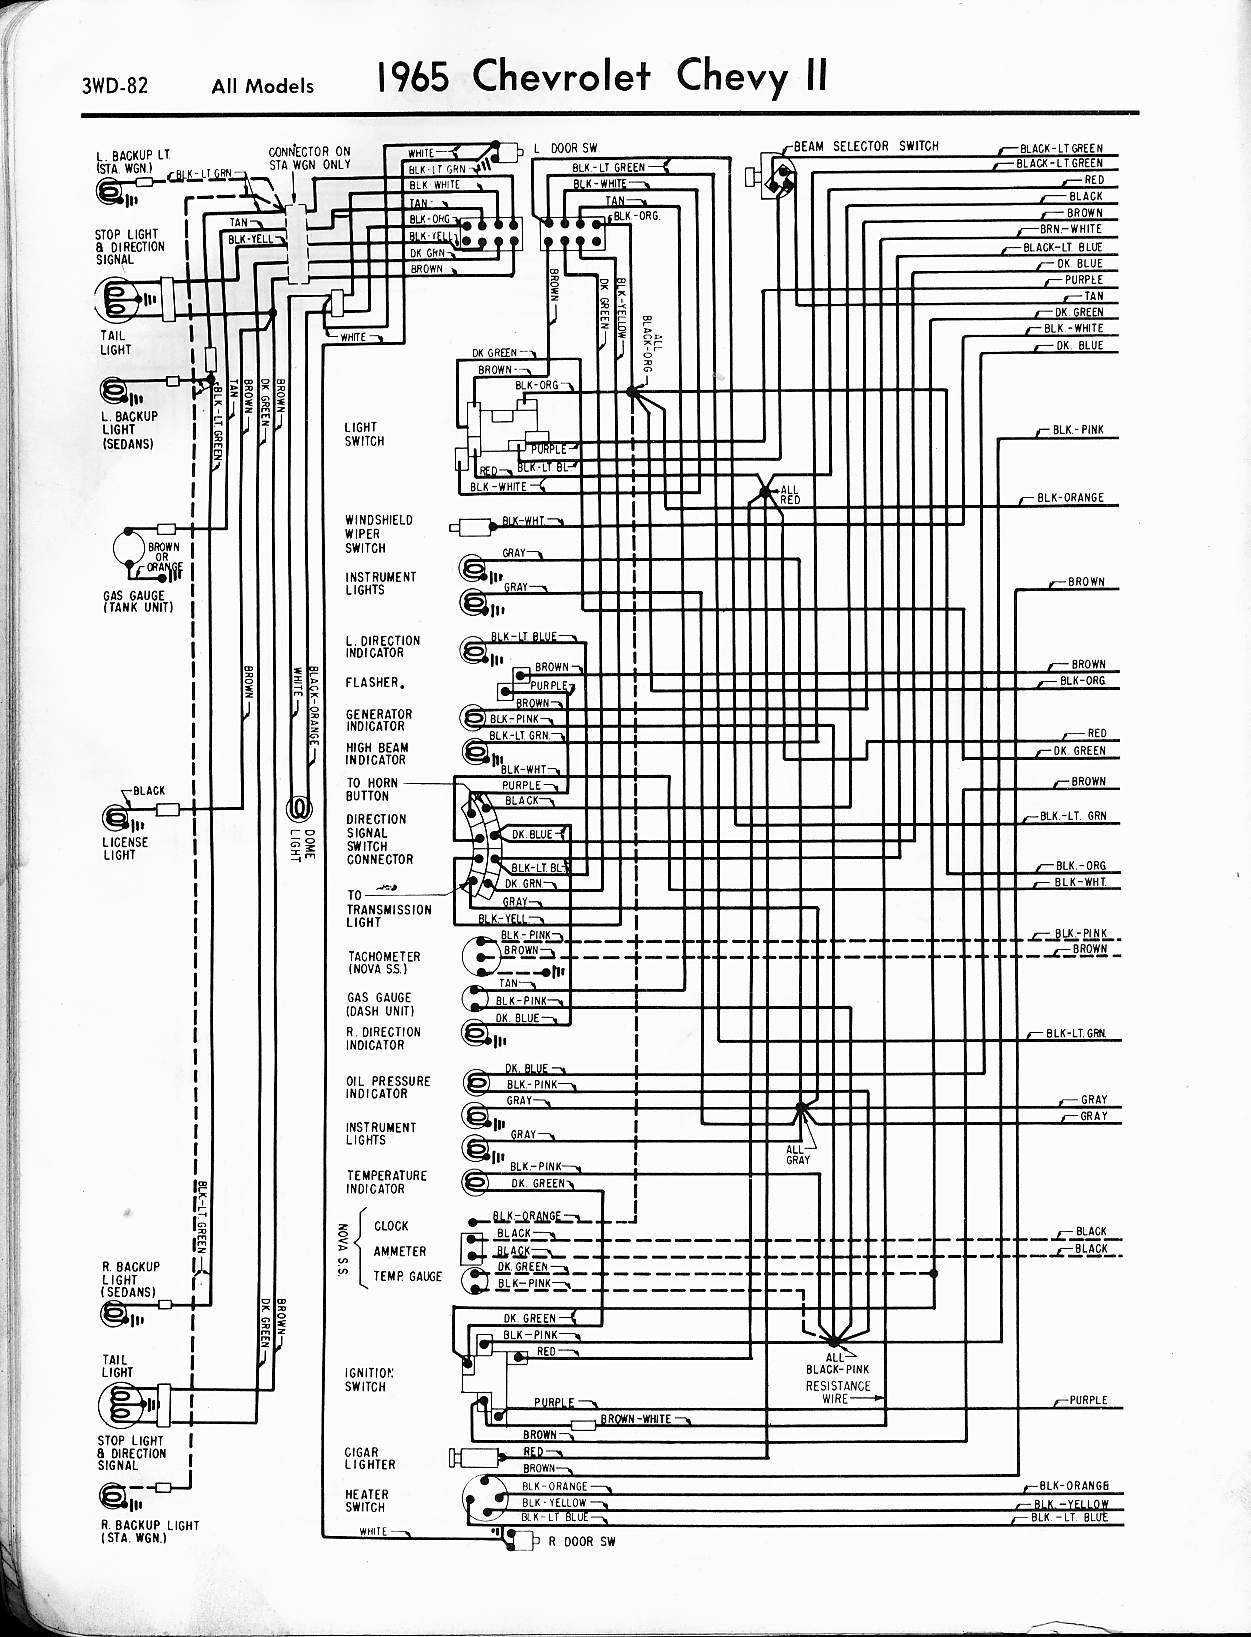 Awesome 1987 Chevy Wiring Wiring Library Wiring Cloud Ittabpendurdonanfuldomelitekicepsianuembamohammedshrineorg